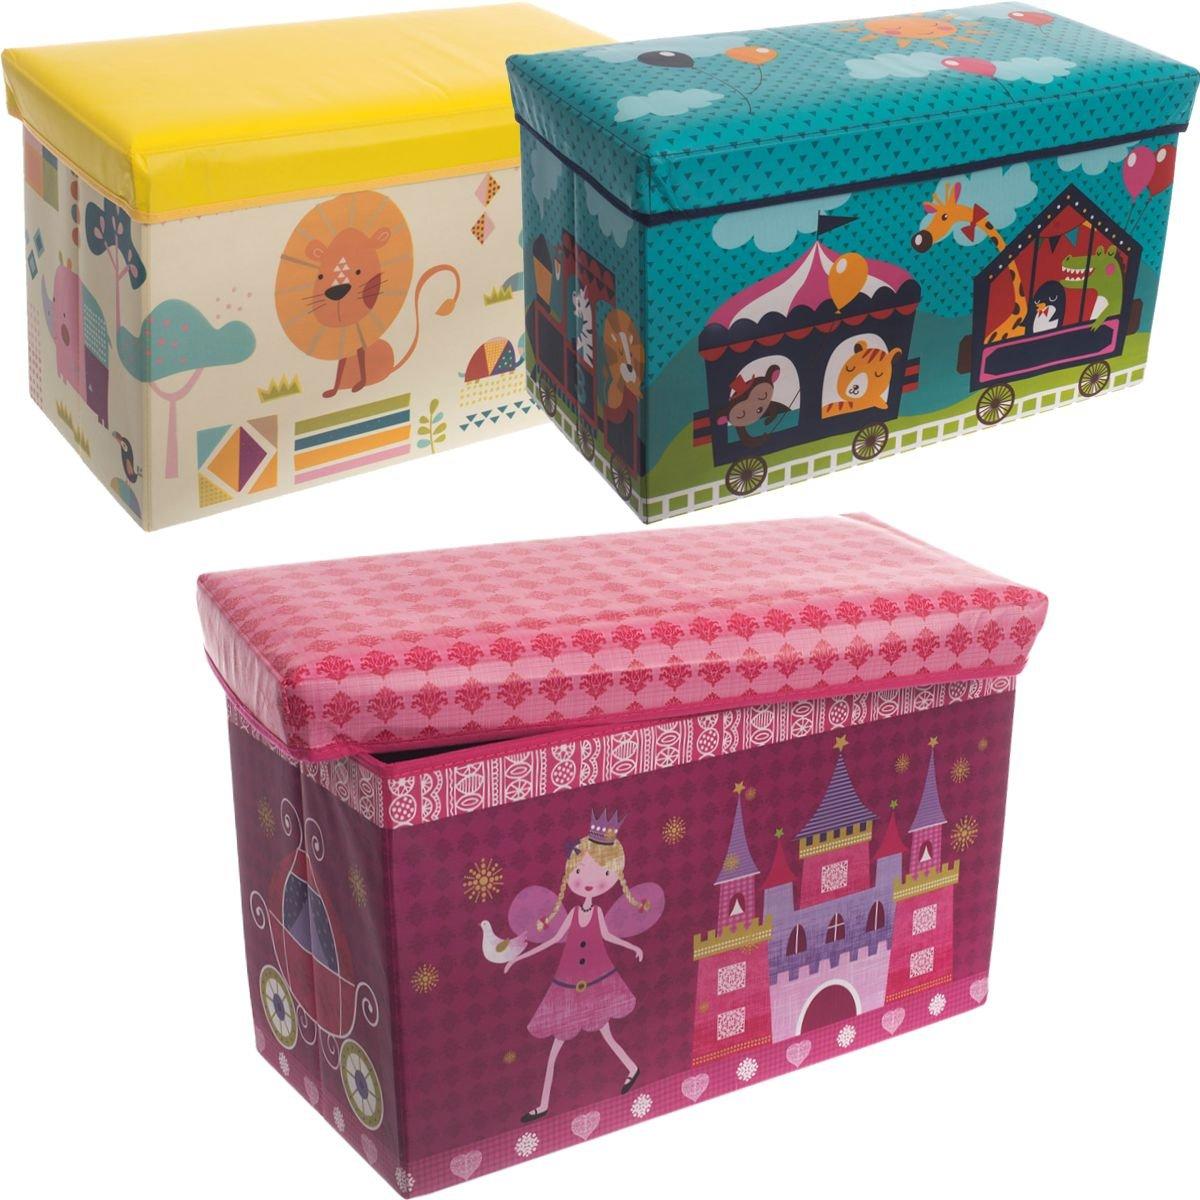 Cassapanca/cesta per giocattoli, 60 x 30 x 35 cm (CIRCO) Stimo24